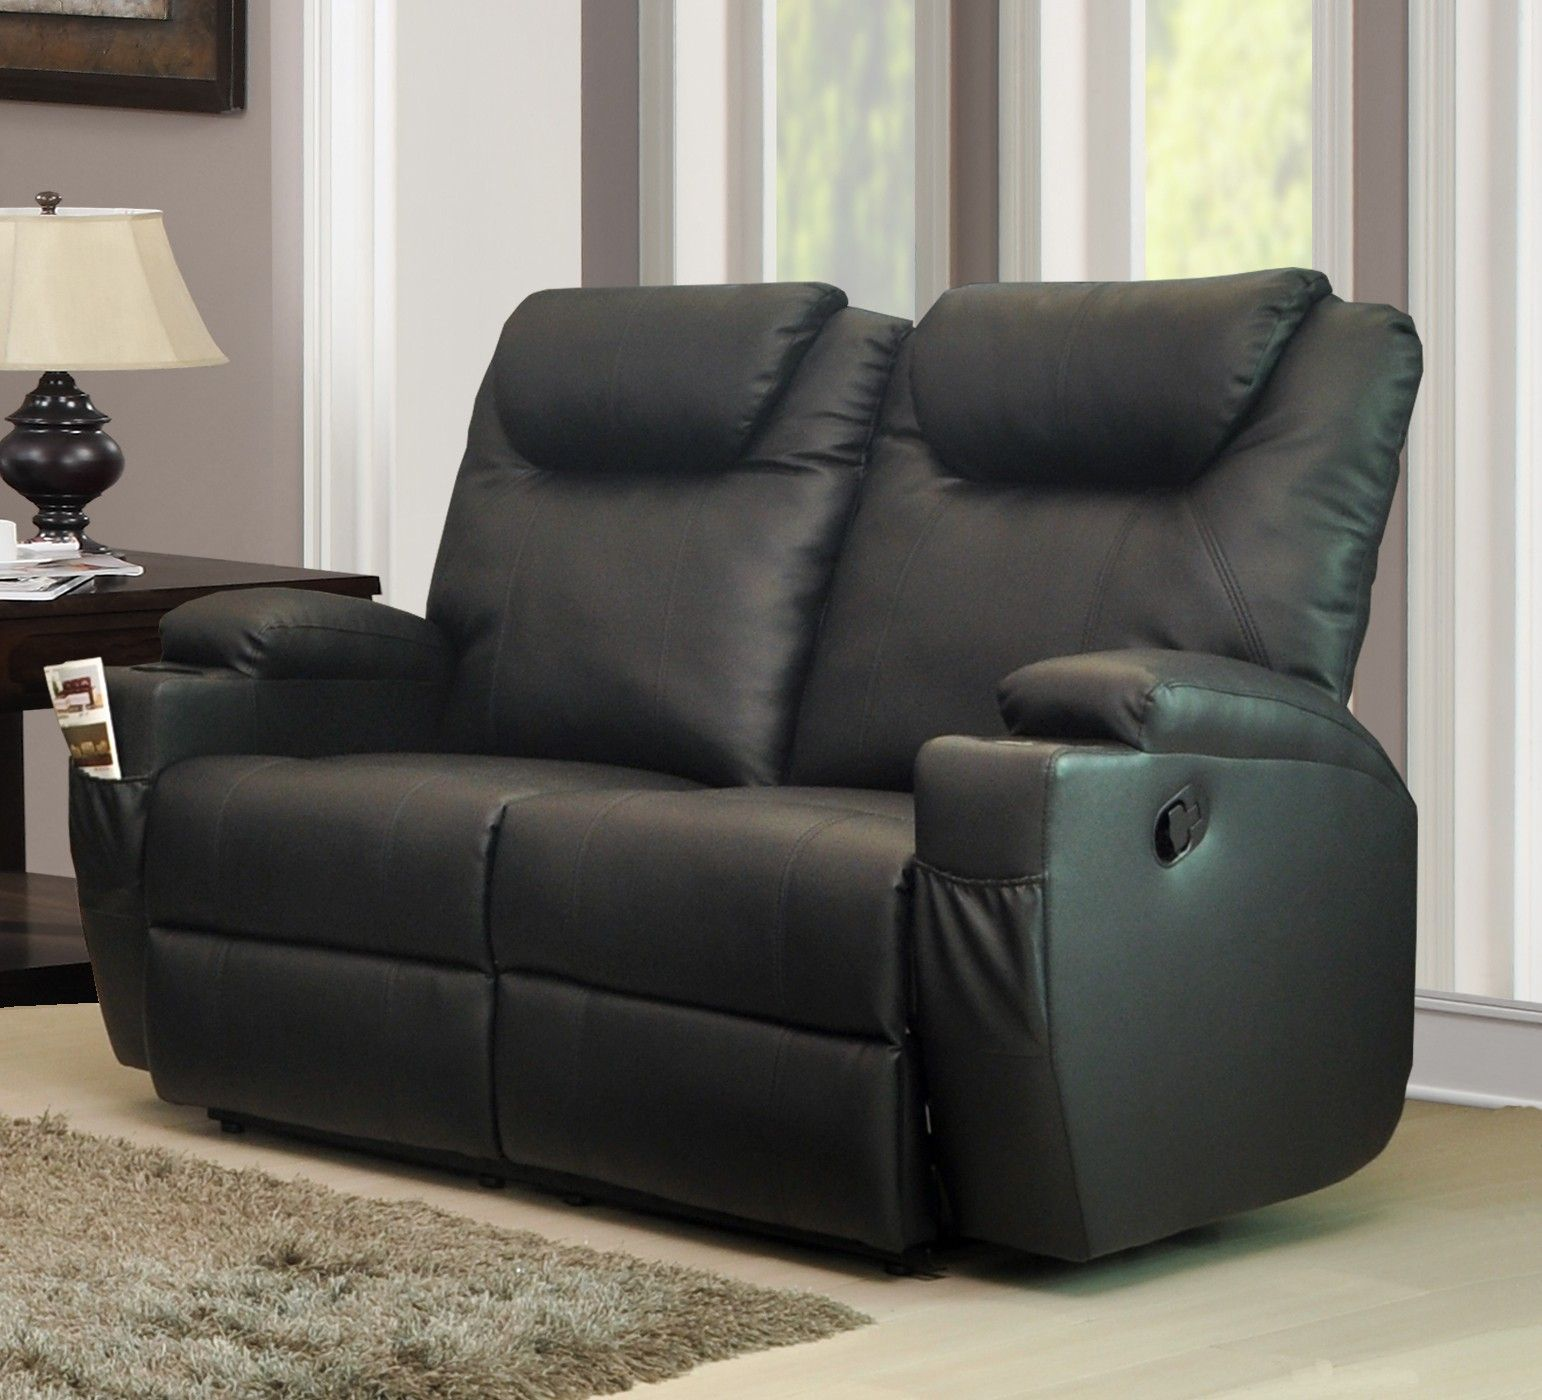 lazyboy leather sofas vitra sofa polder furniture living room black full grain reclining